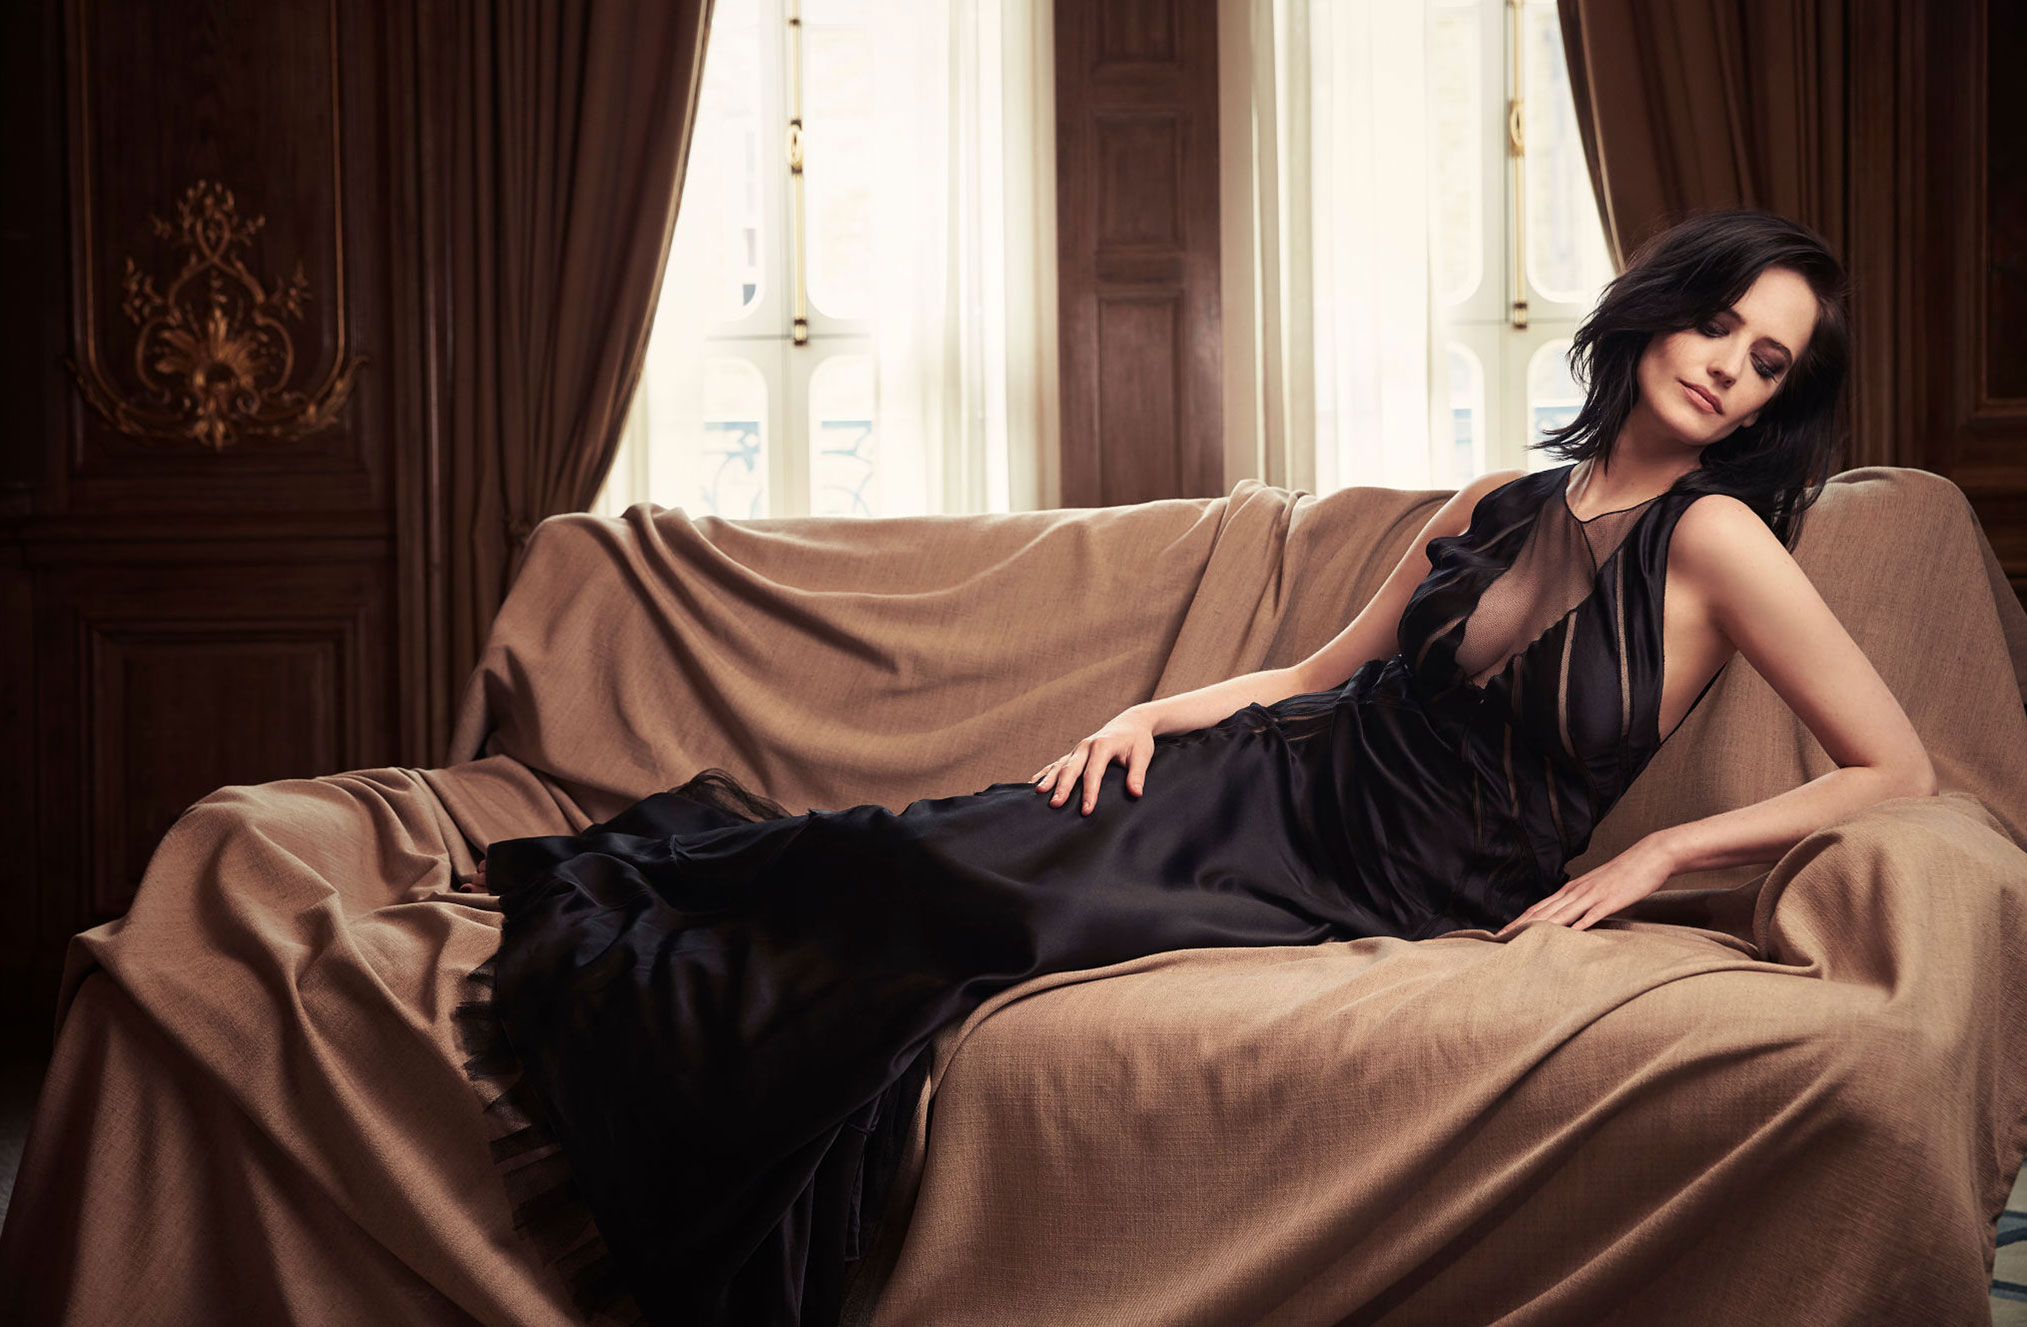 промосъемка Евы Грин для киностудии 20th Century Fox / фото 11